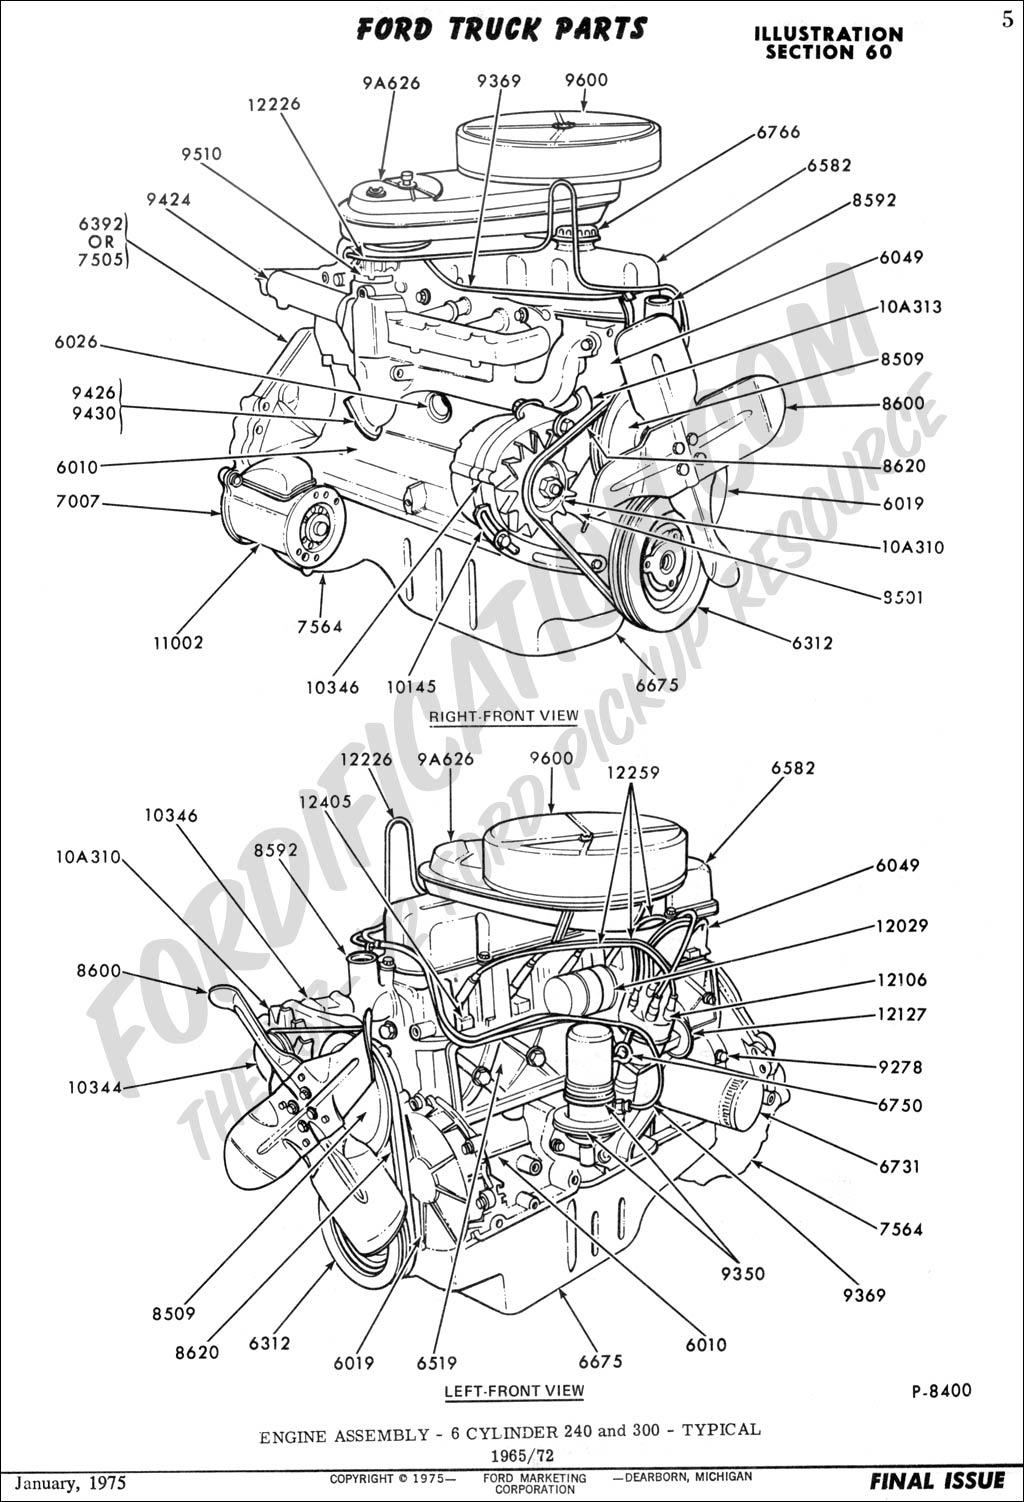 Chevy 250 Inline 6 Diagram : chevy, inline, diagram, Chevy, Engine, Diagram, Wiring, Check, Belt-uniform, Belt-uniform.ilariaforlani.it